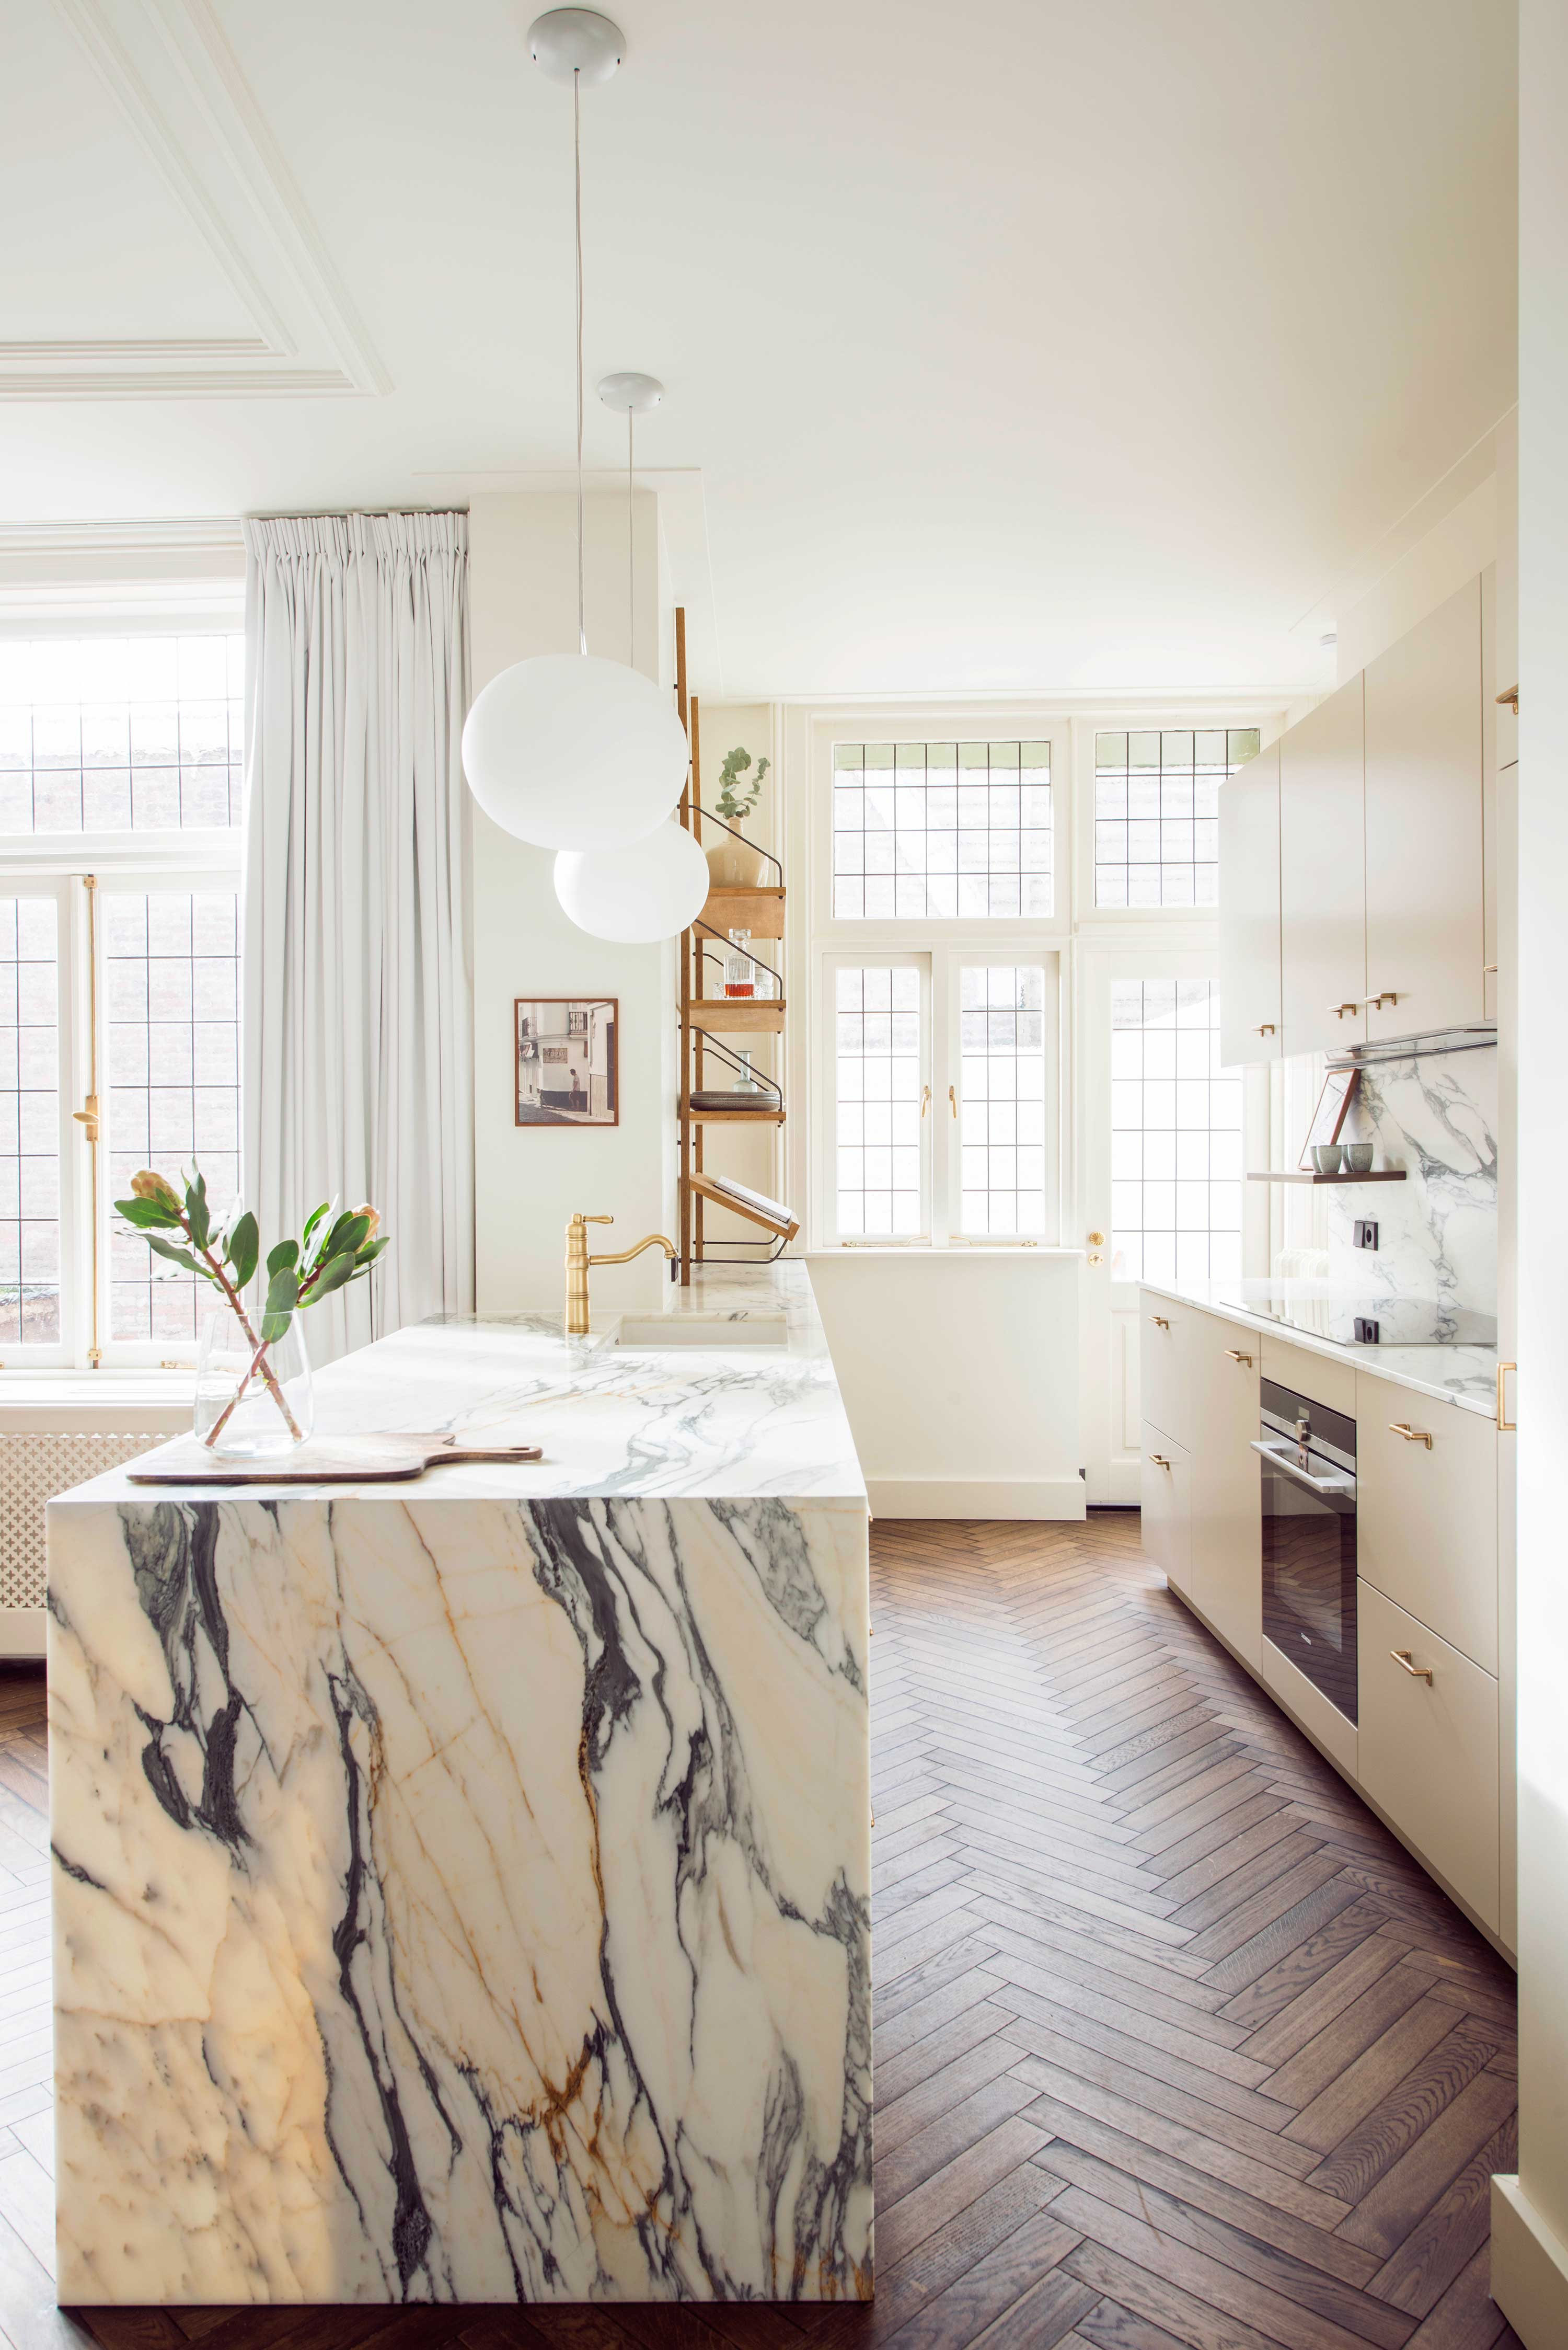 kitchen design studio34 south haarlem residence interior design oak shelving styling marble kitchen wood herringbone flos light light white bright